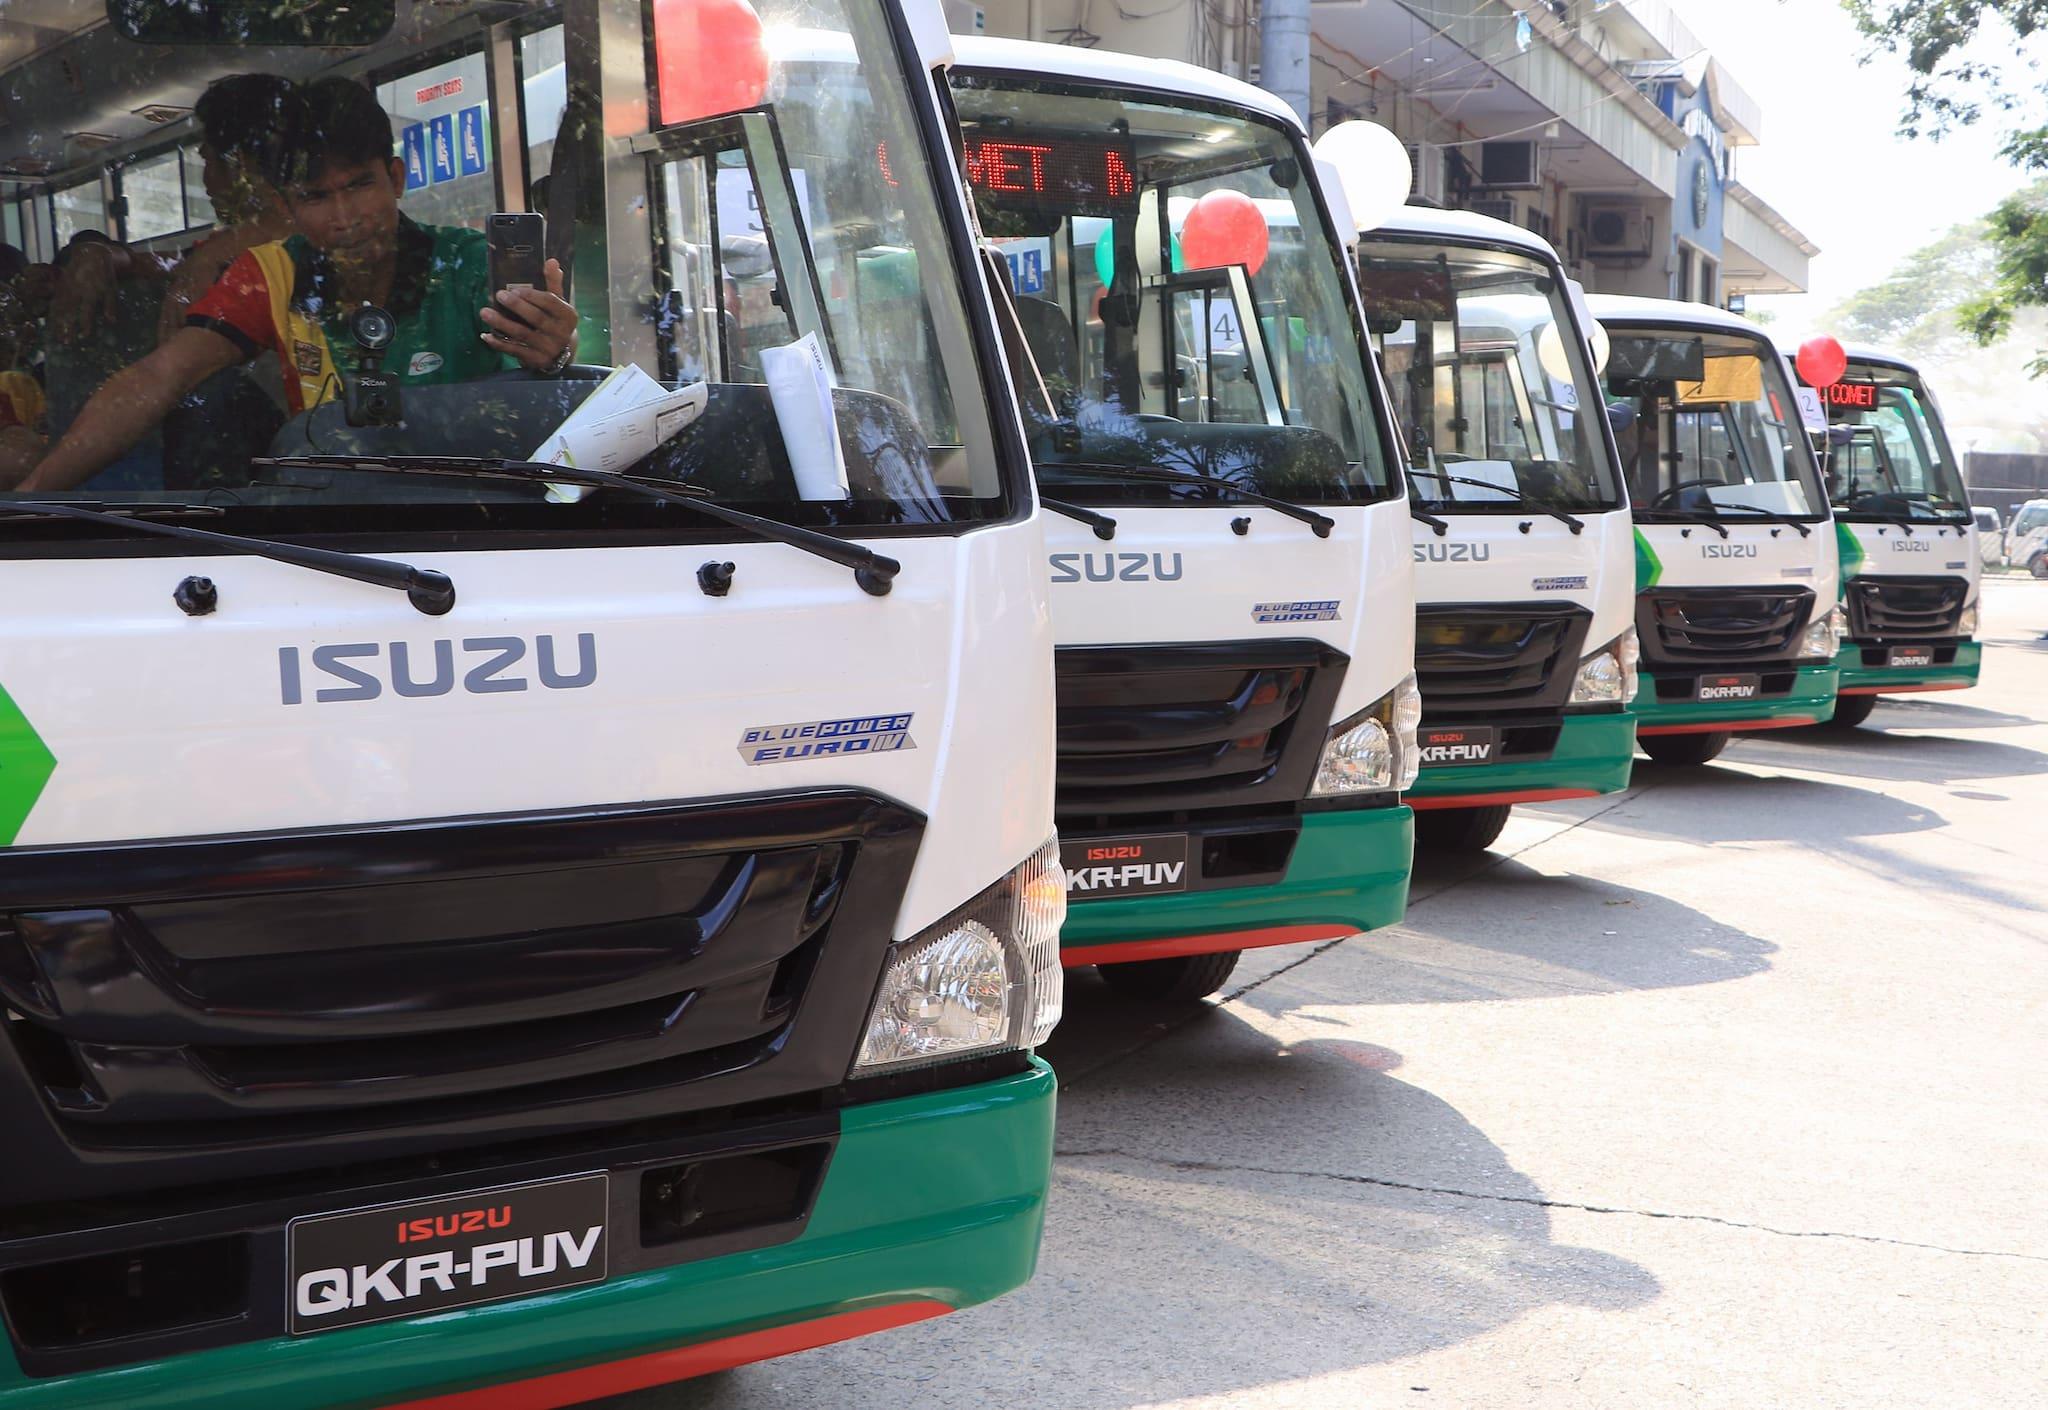 Isuzu PH Turns Over 15 Modernized Class 3 PUV Units to Metro Comet Transport Cooperative